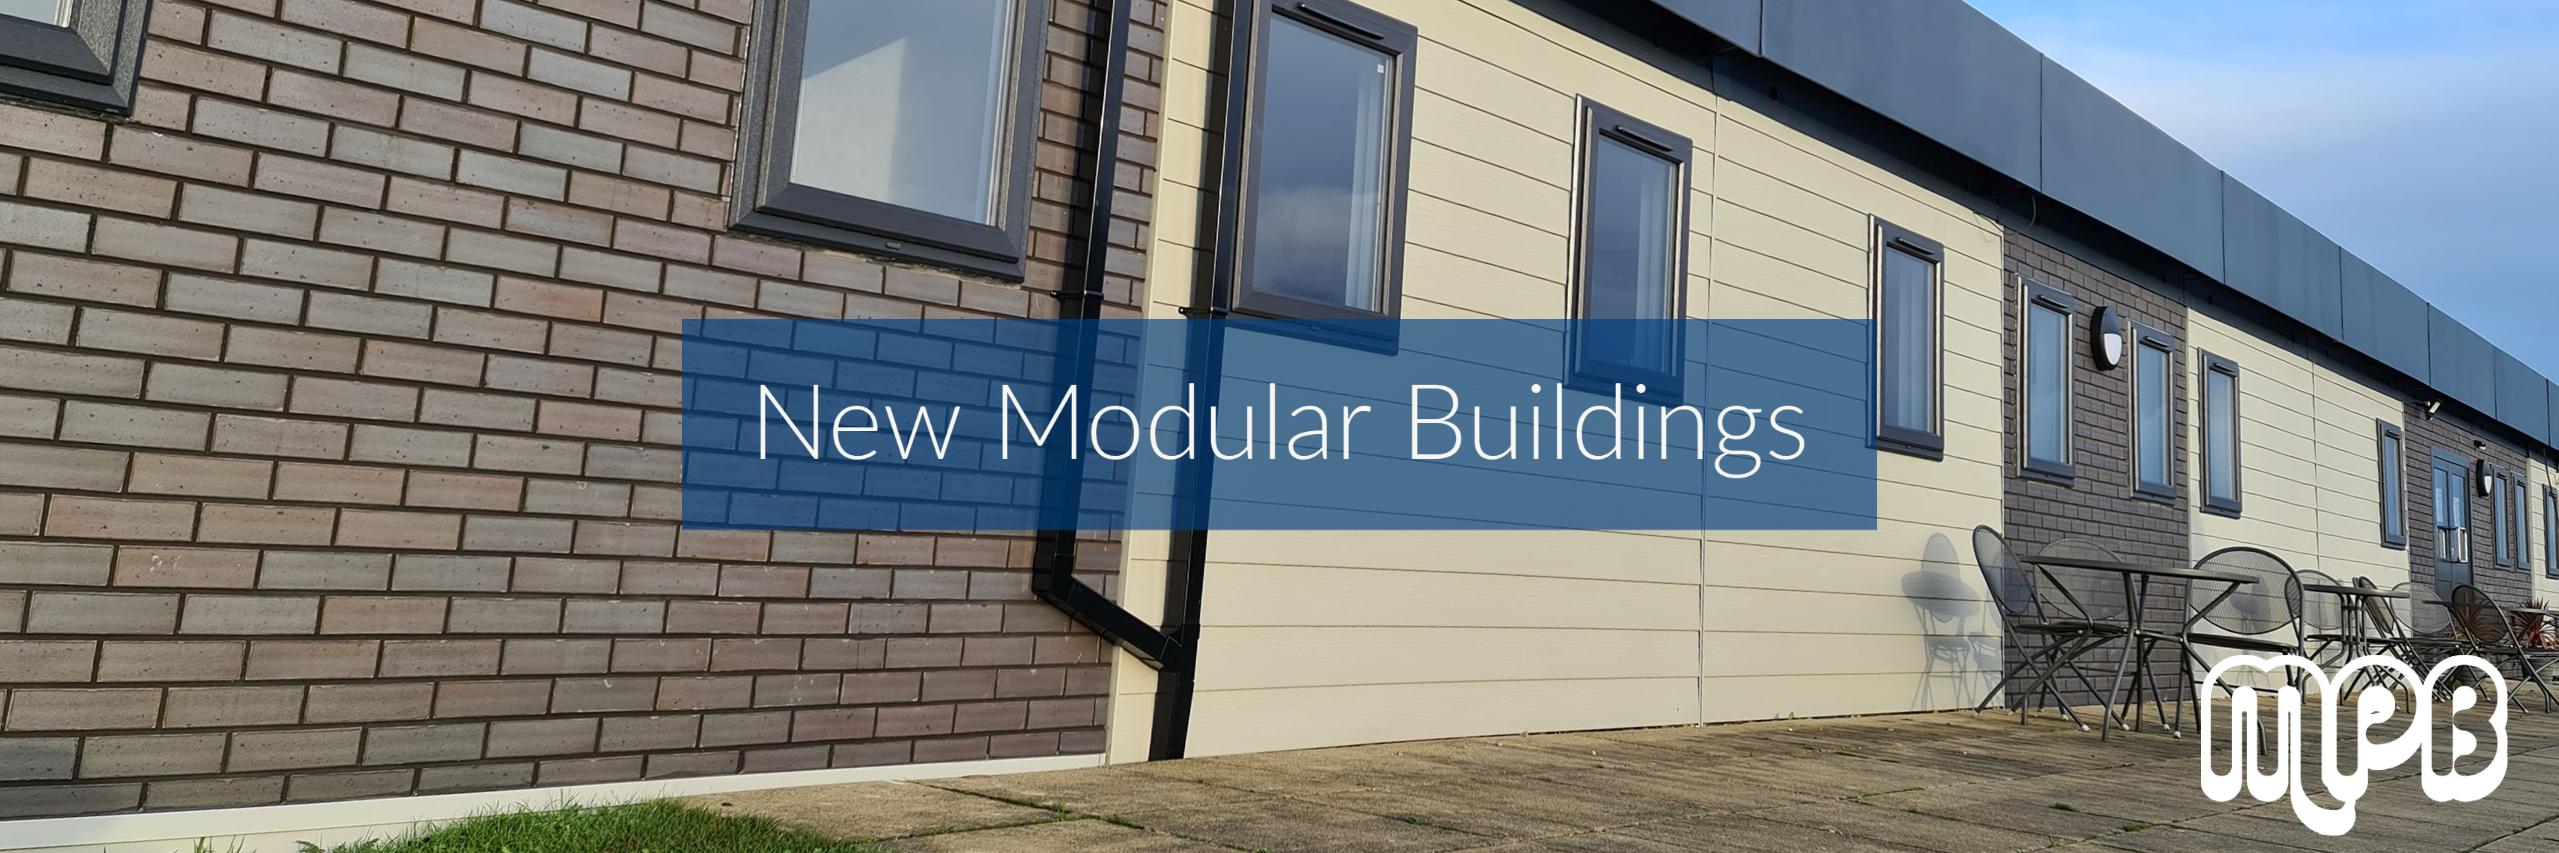 New Modular Buildings